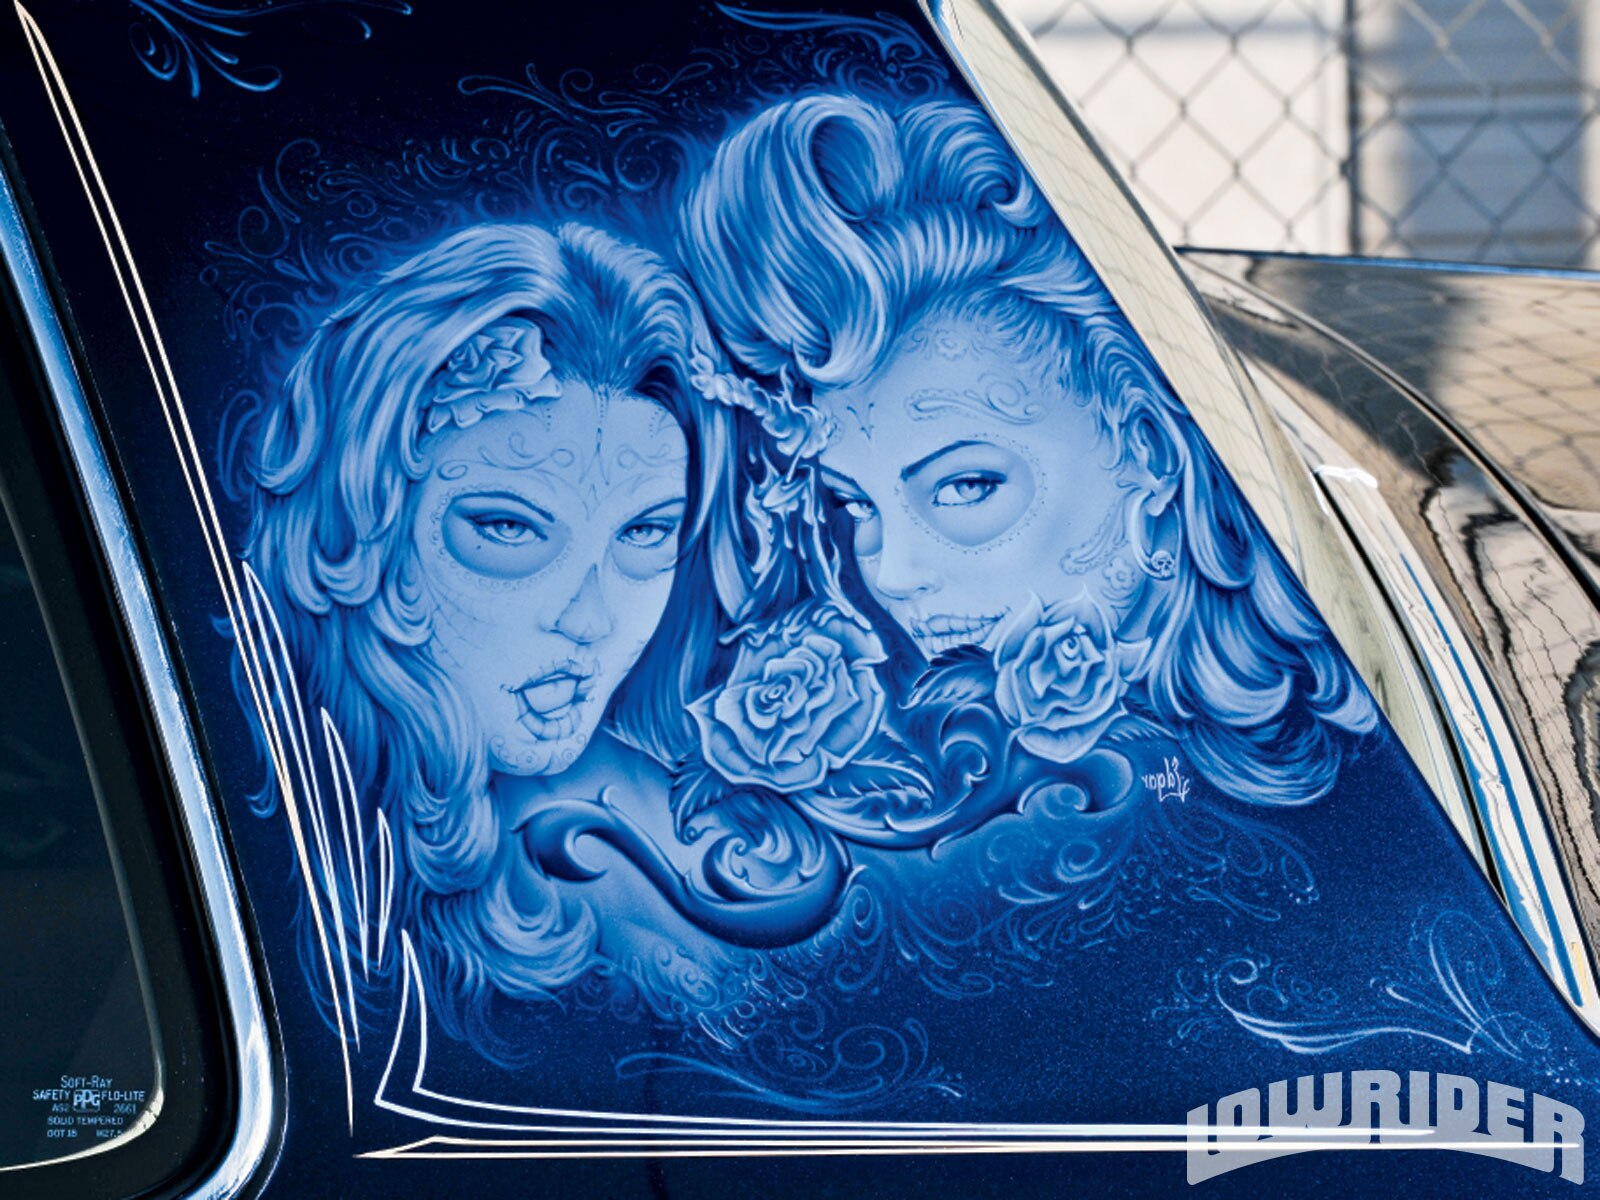 Lowrider Airbrush Art On Cars Www Pixshark Com Images